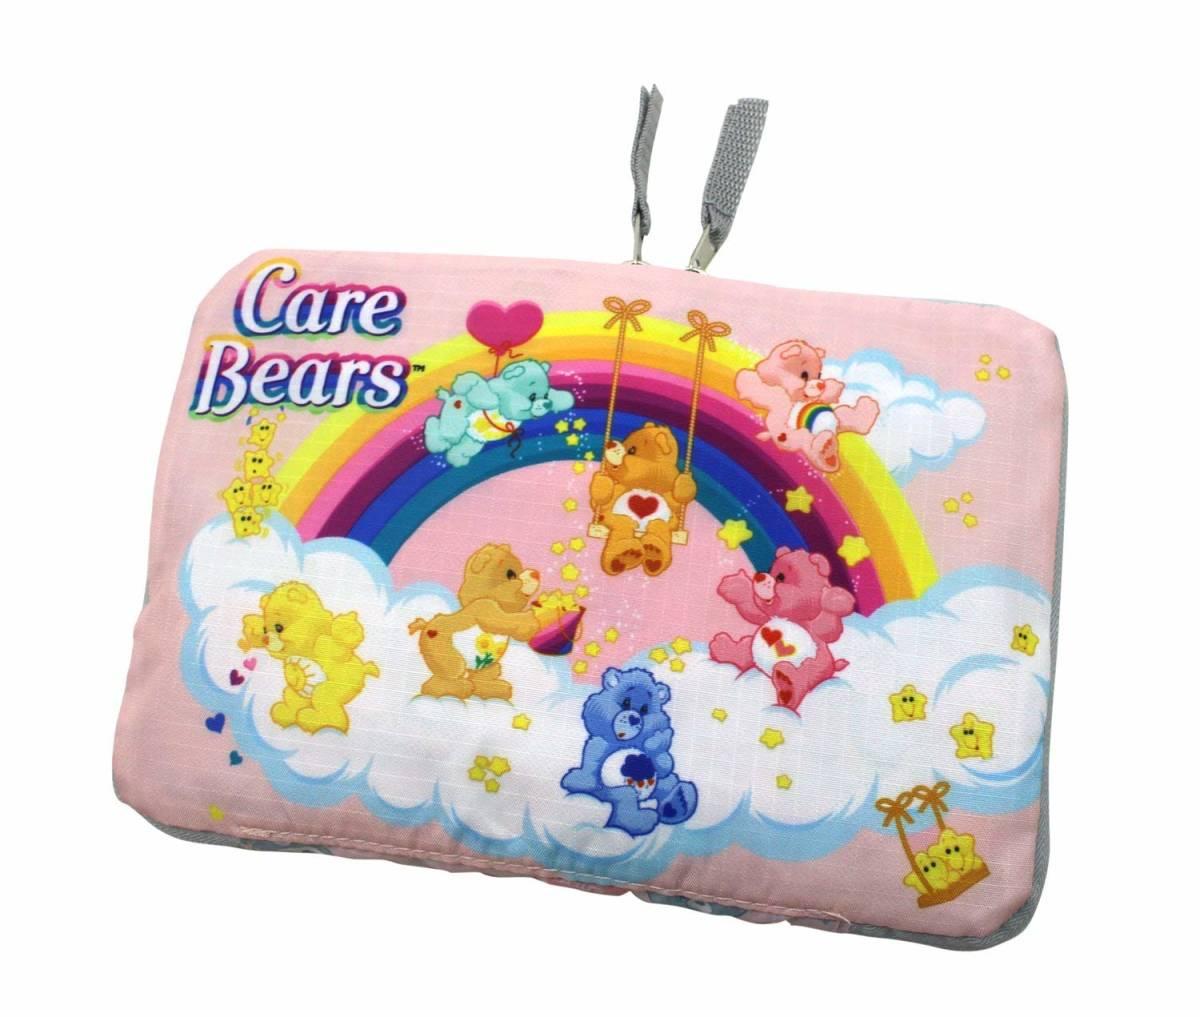 "новый товар бесплатная доставка уход Bear compact сумка ""Boston bag"" розовый"